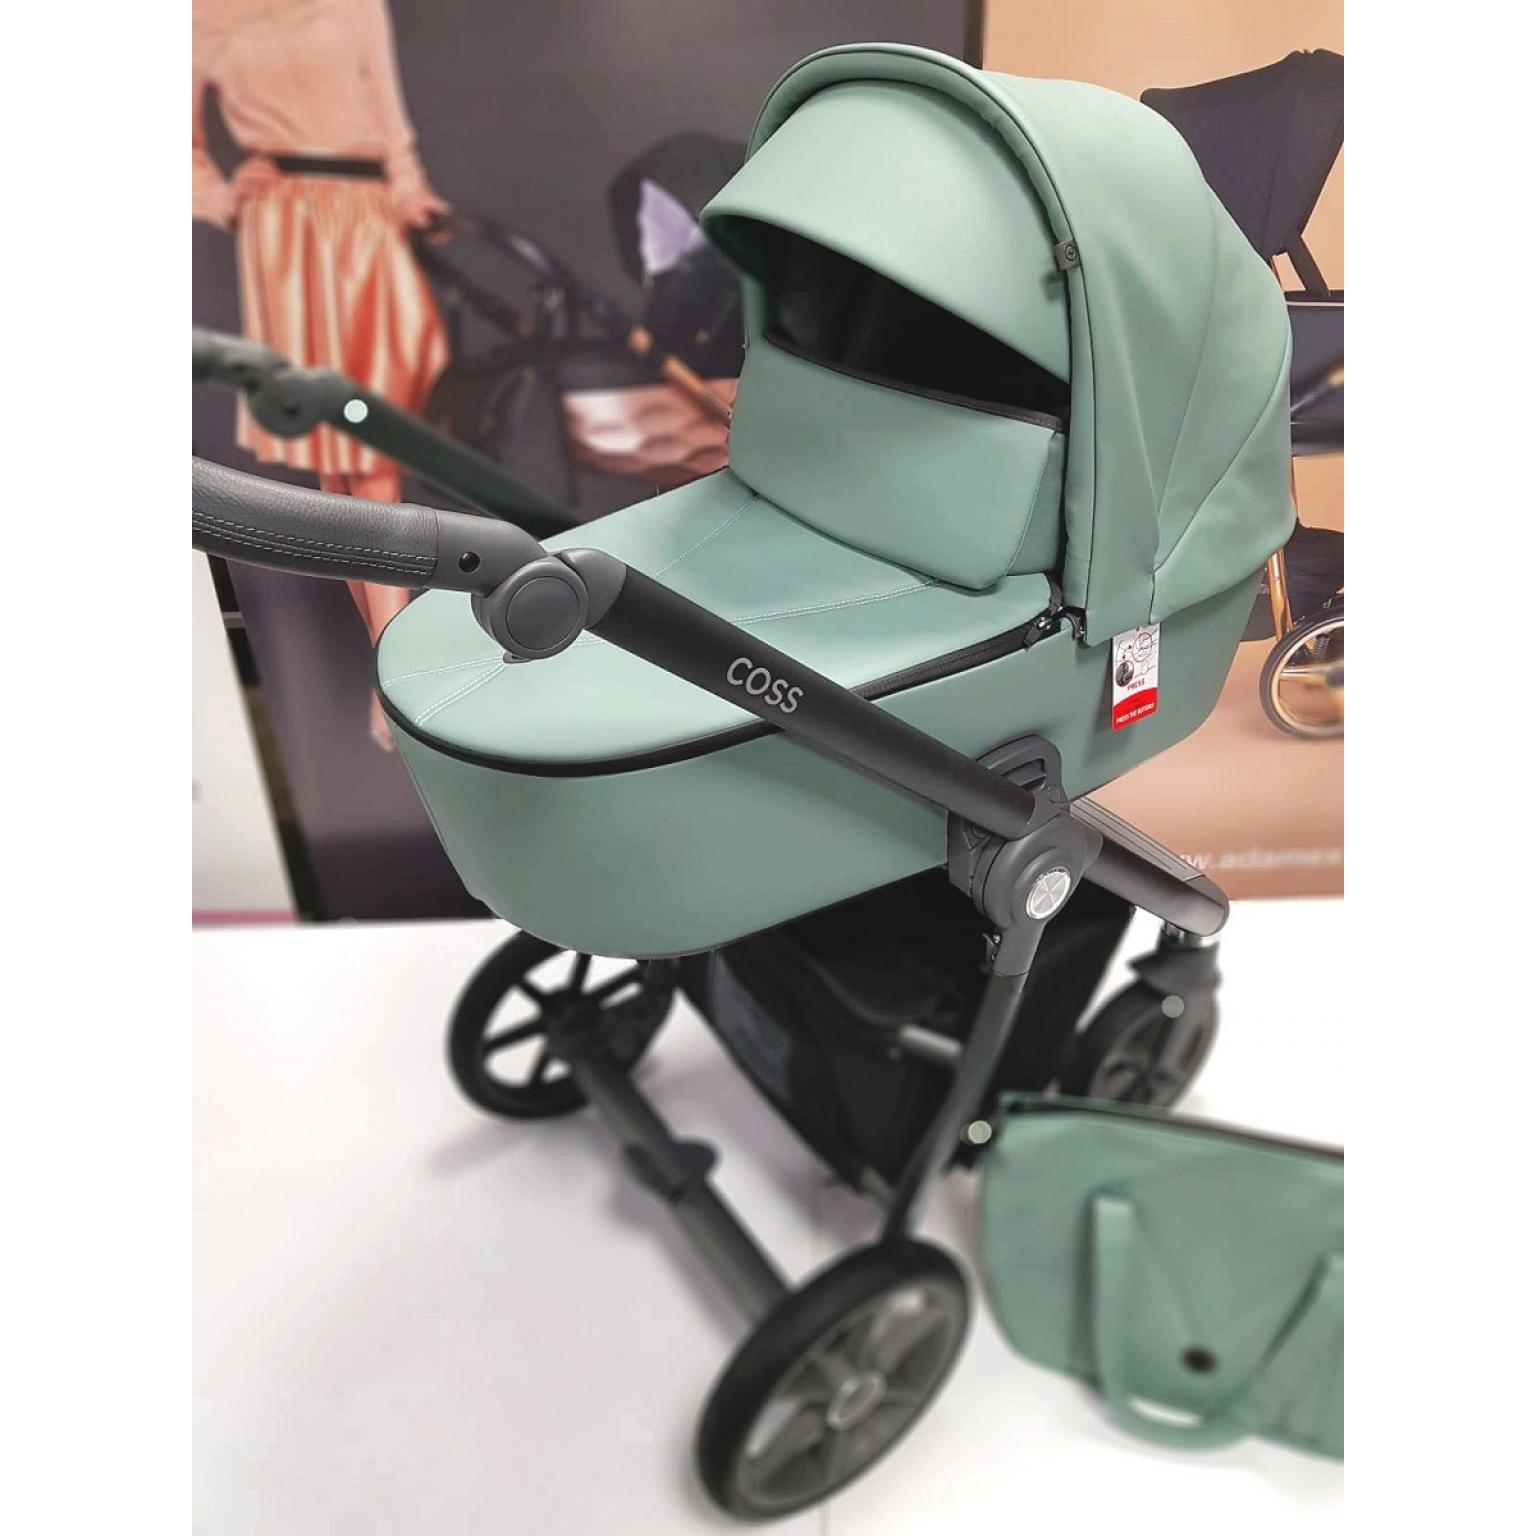 Bērnu-rati-ROAN-BASS-NEXT-ECO-ĀDA-Mint-детская-коляска-3